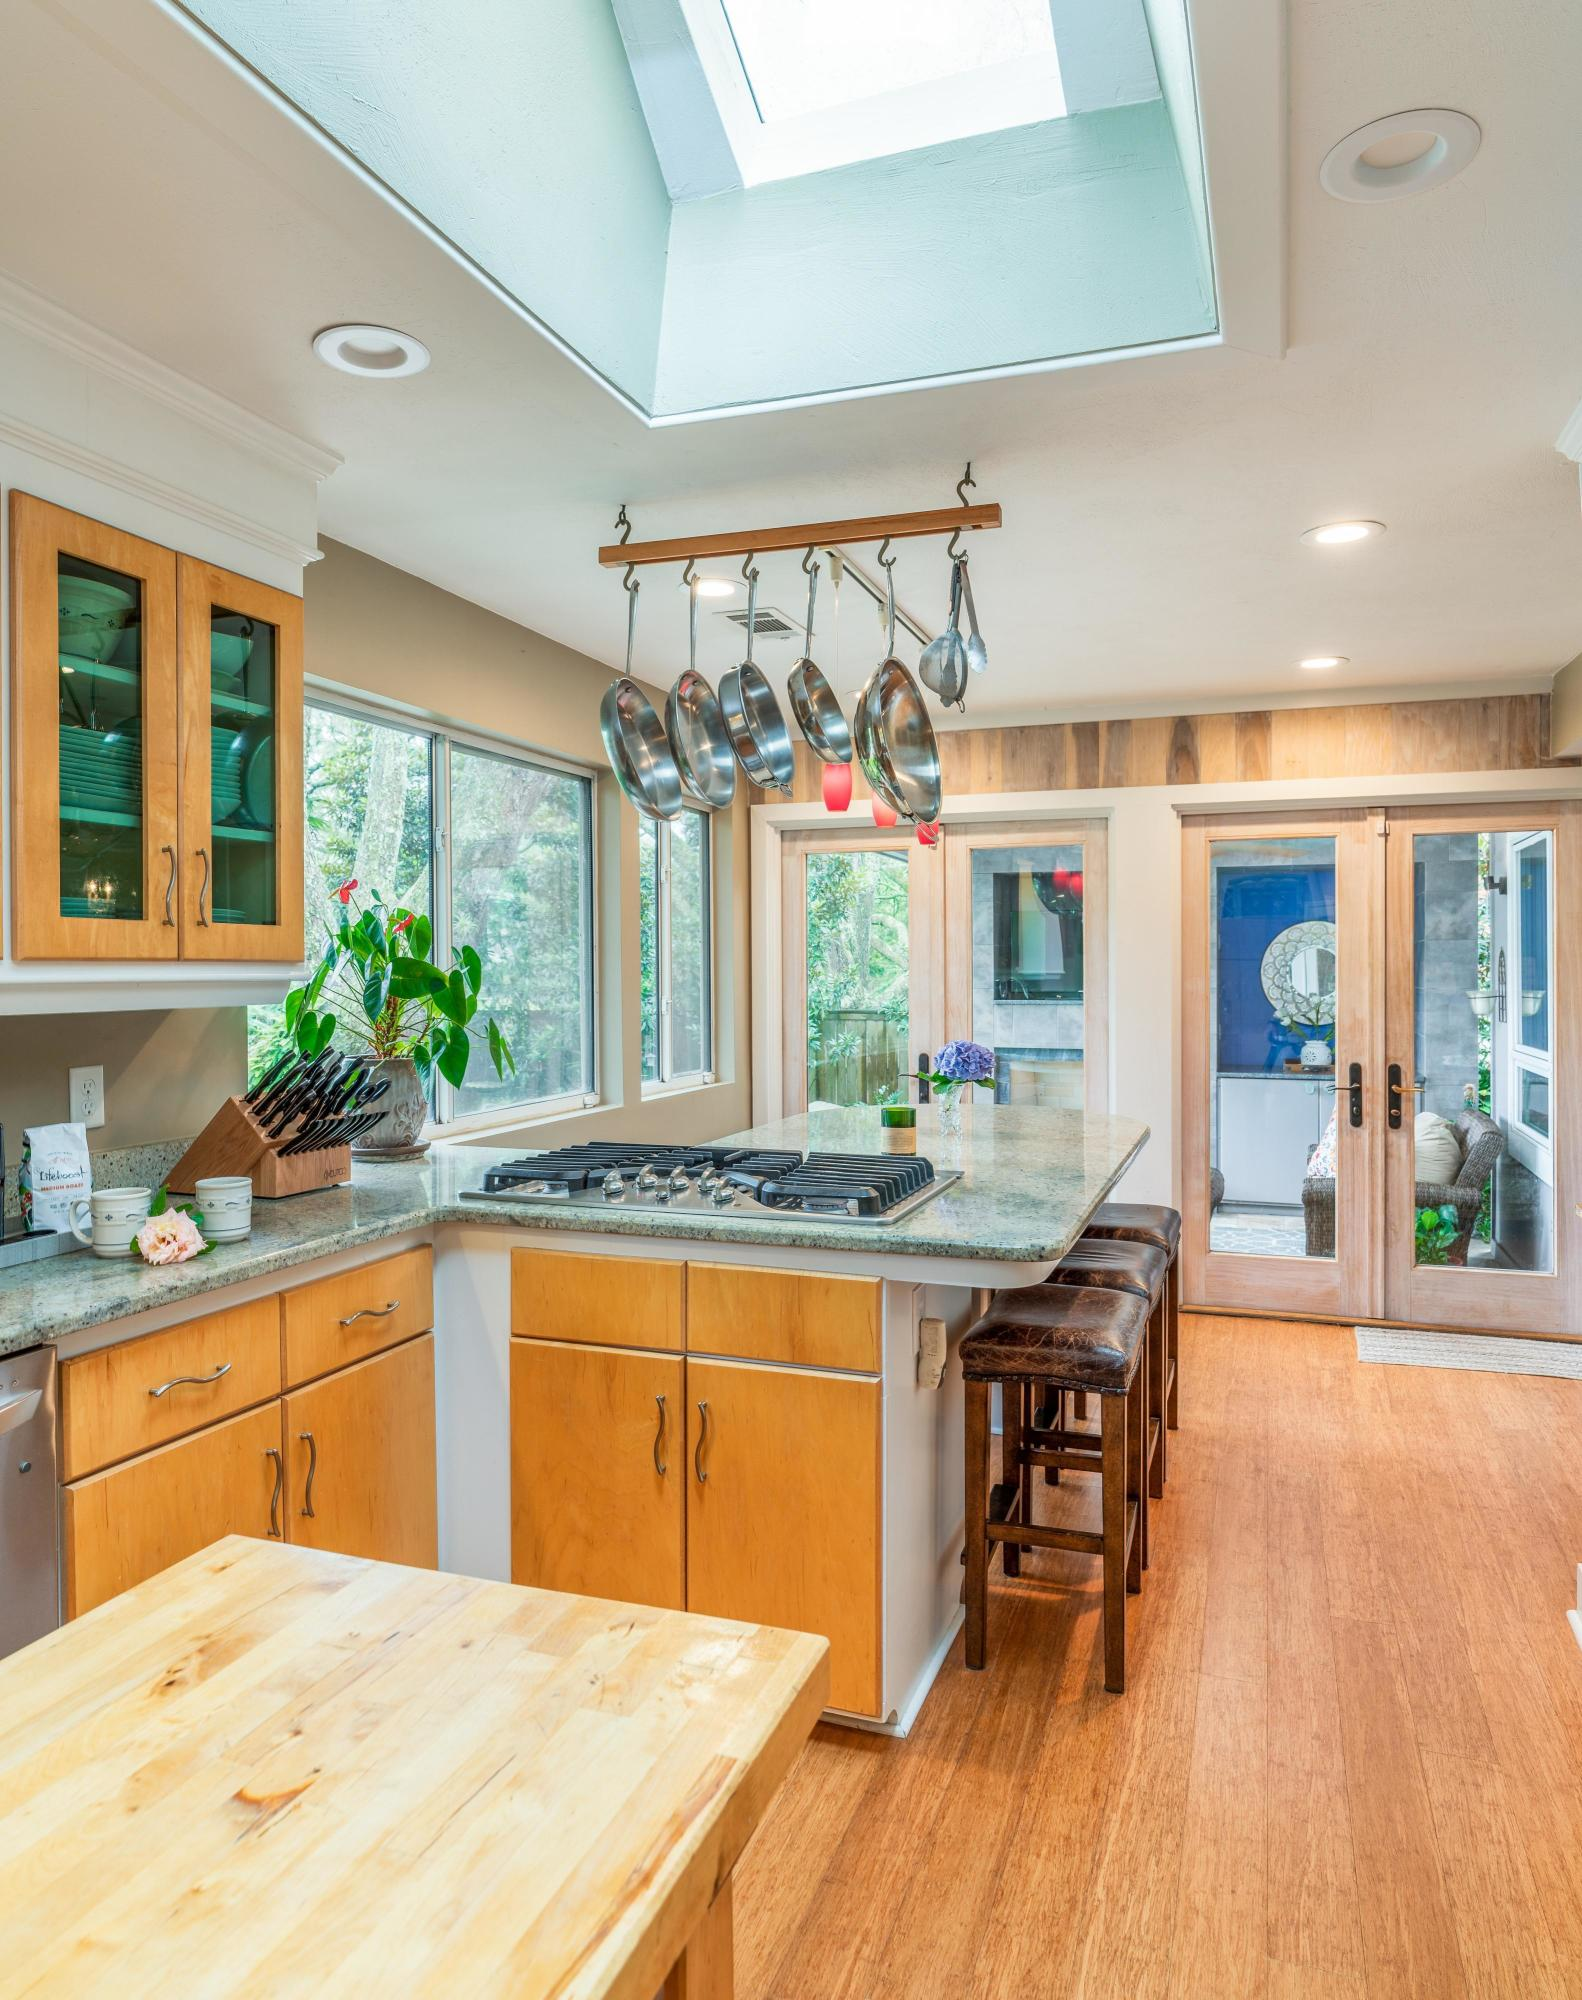 White Point Estates Homes For Sale - 894 White Point, Charleston, SC - 1